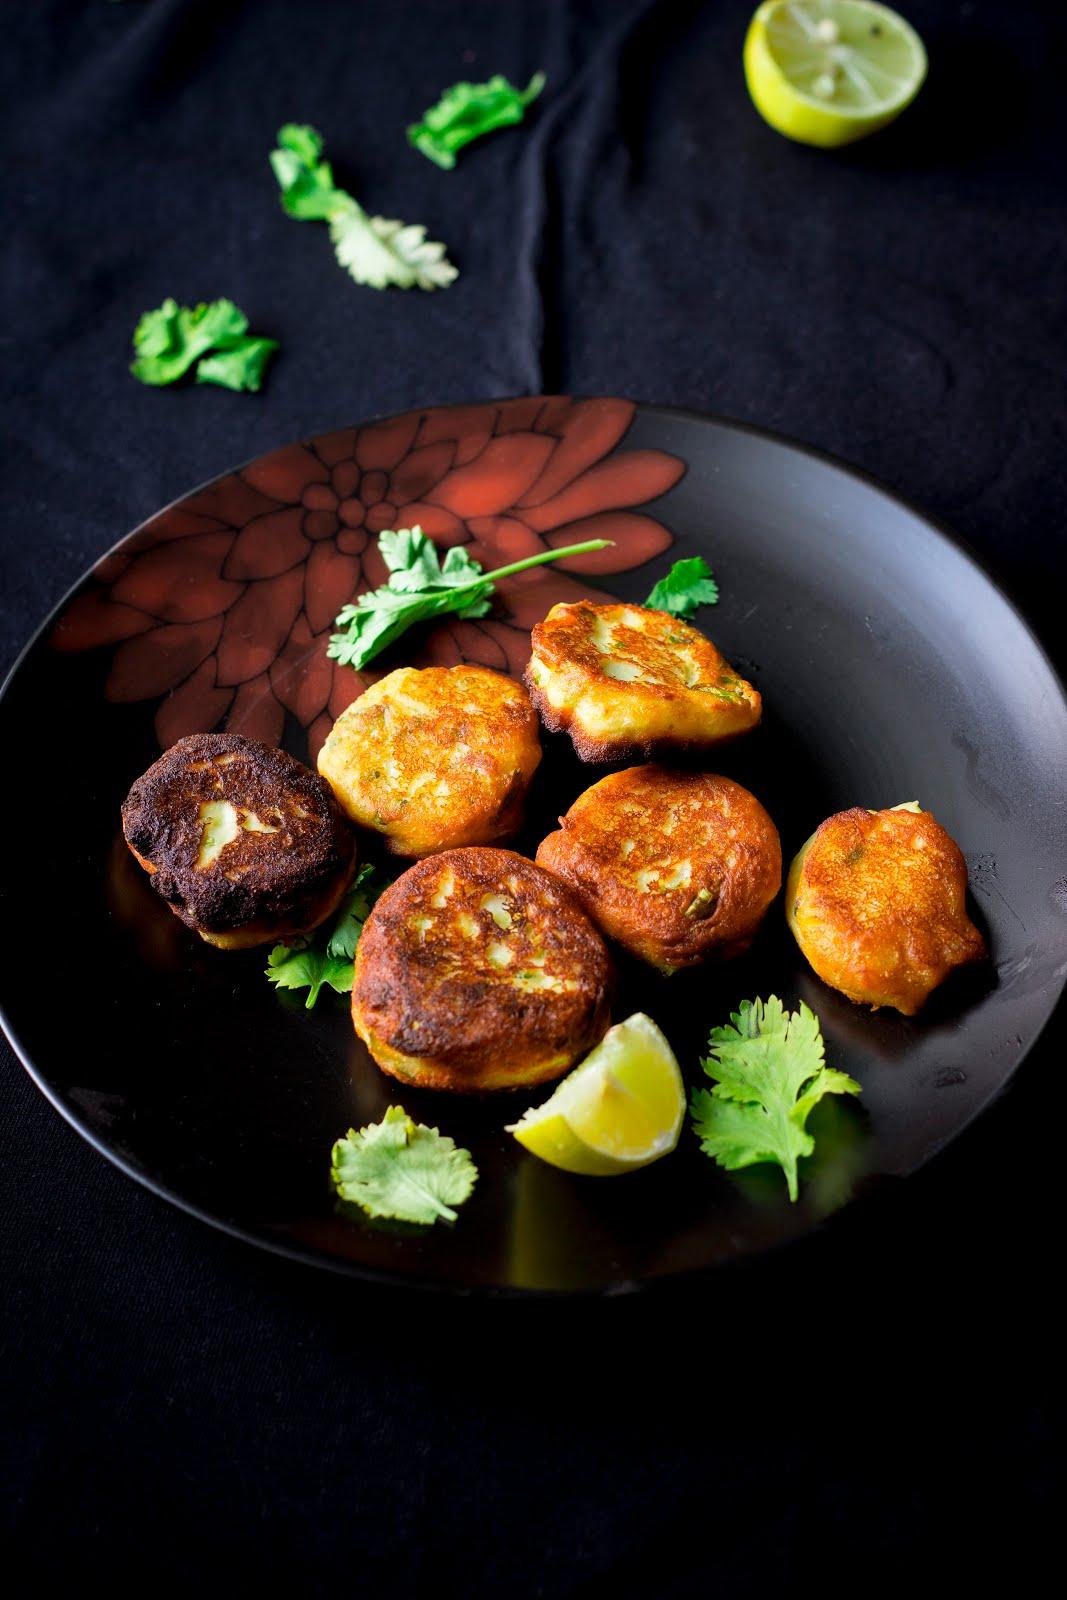 Dahi Kebab Yogurt Kebab kabab kebob hung curd punjabi besan chickpeas snacks